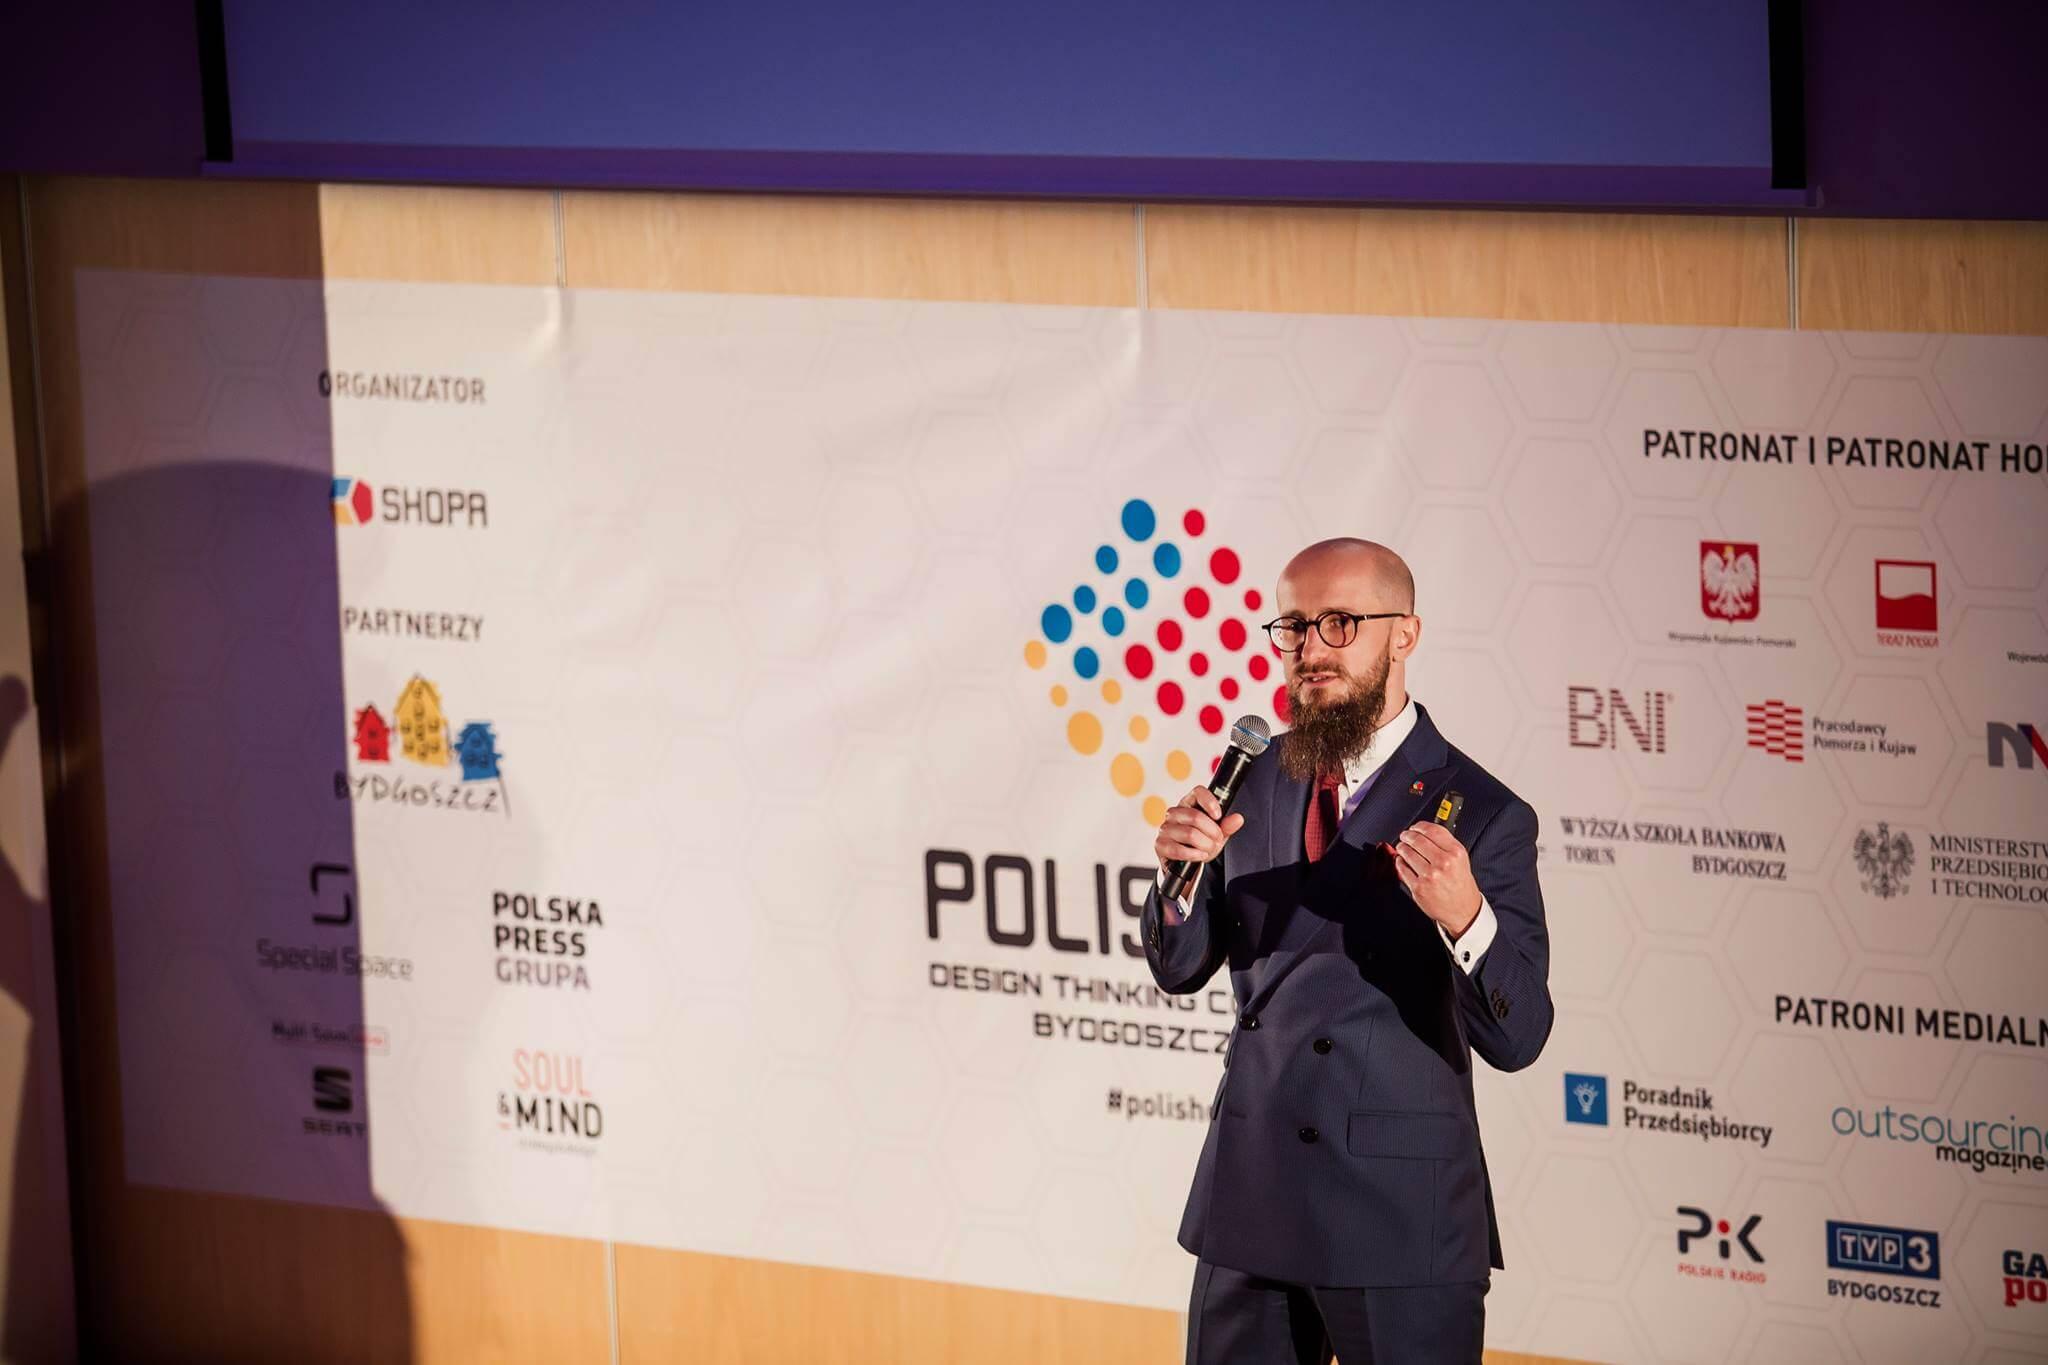 POLISHOPA 2018